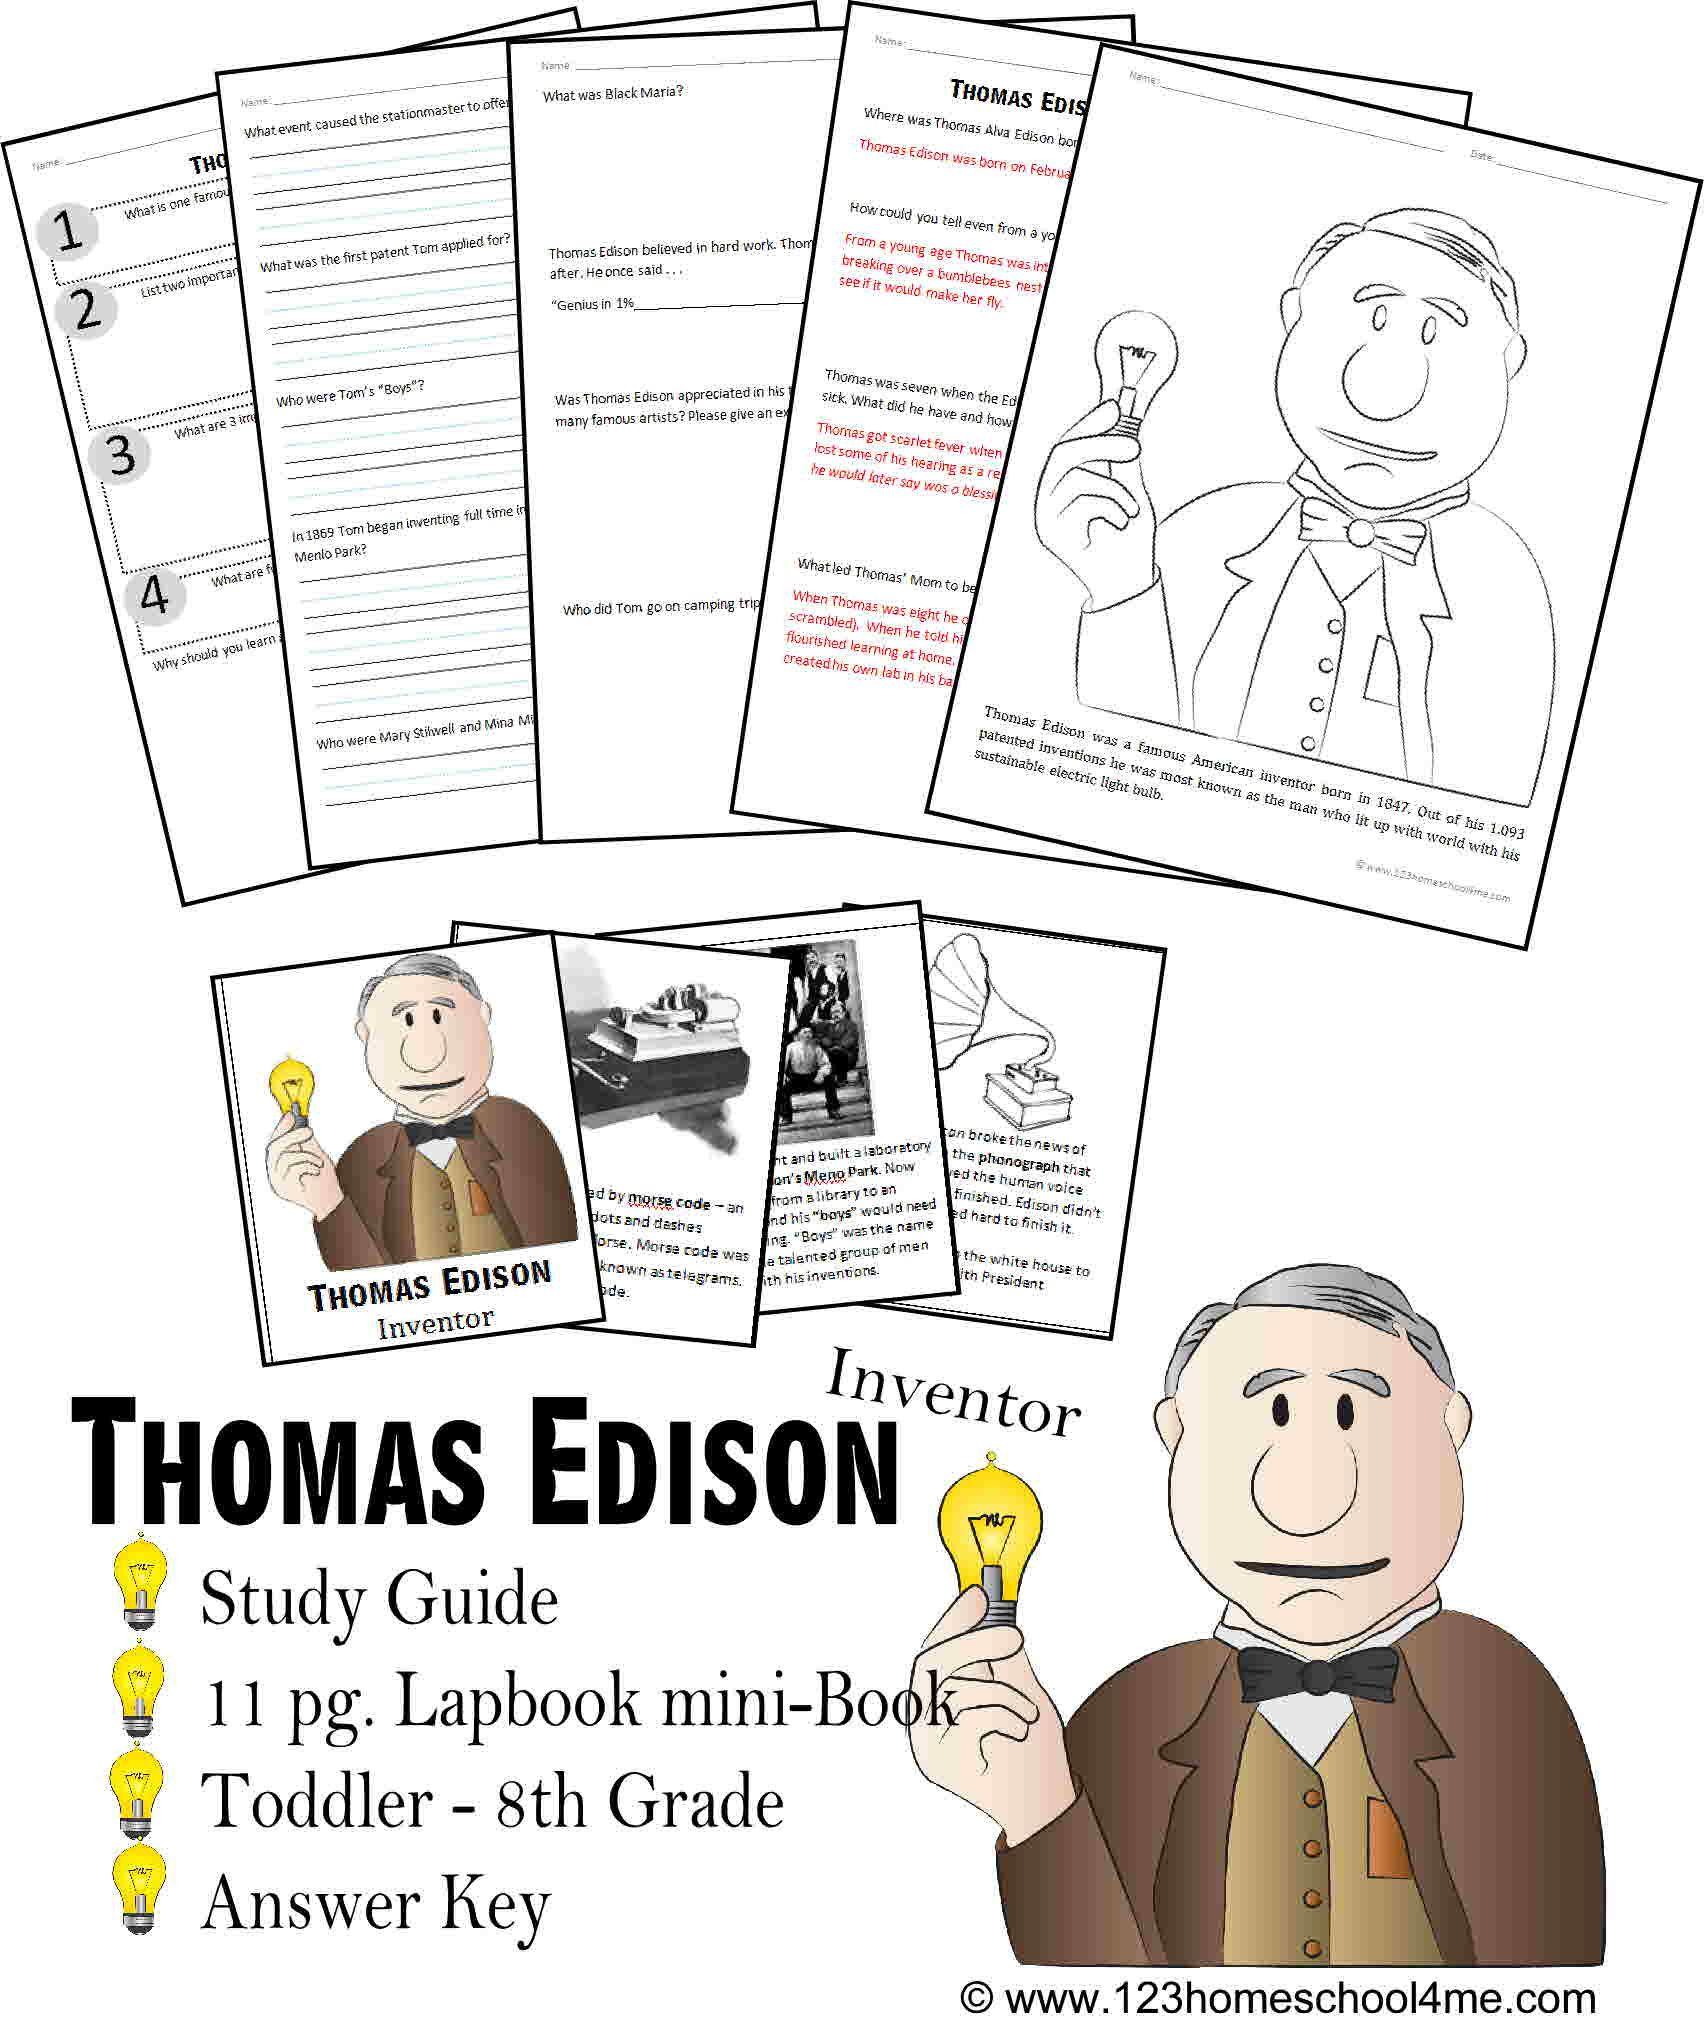 Thomas Edison Biography Report K 8th